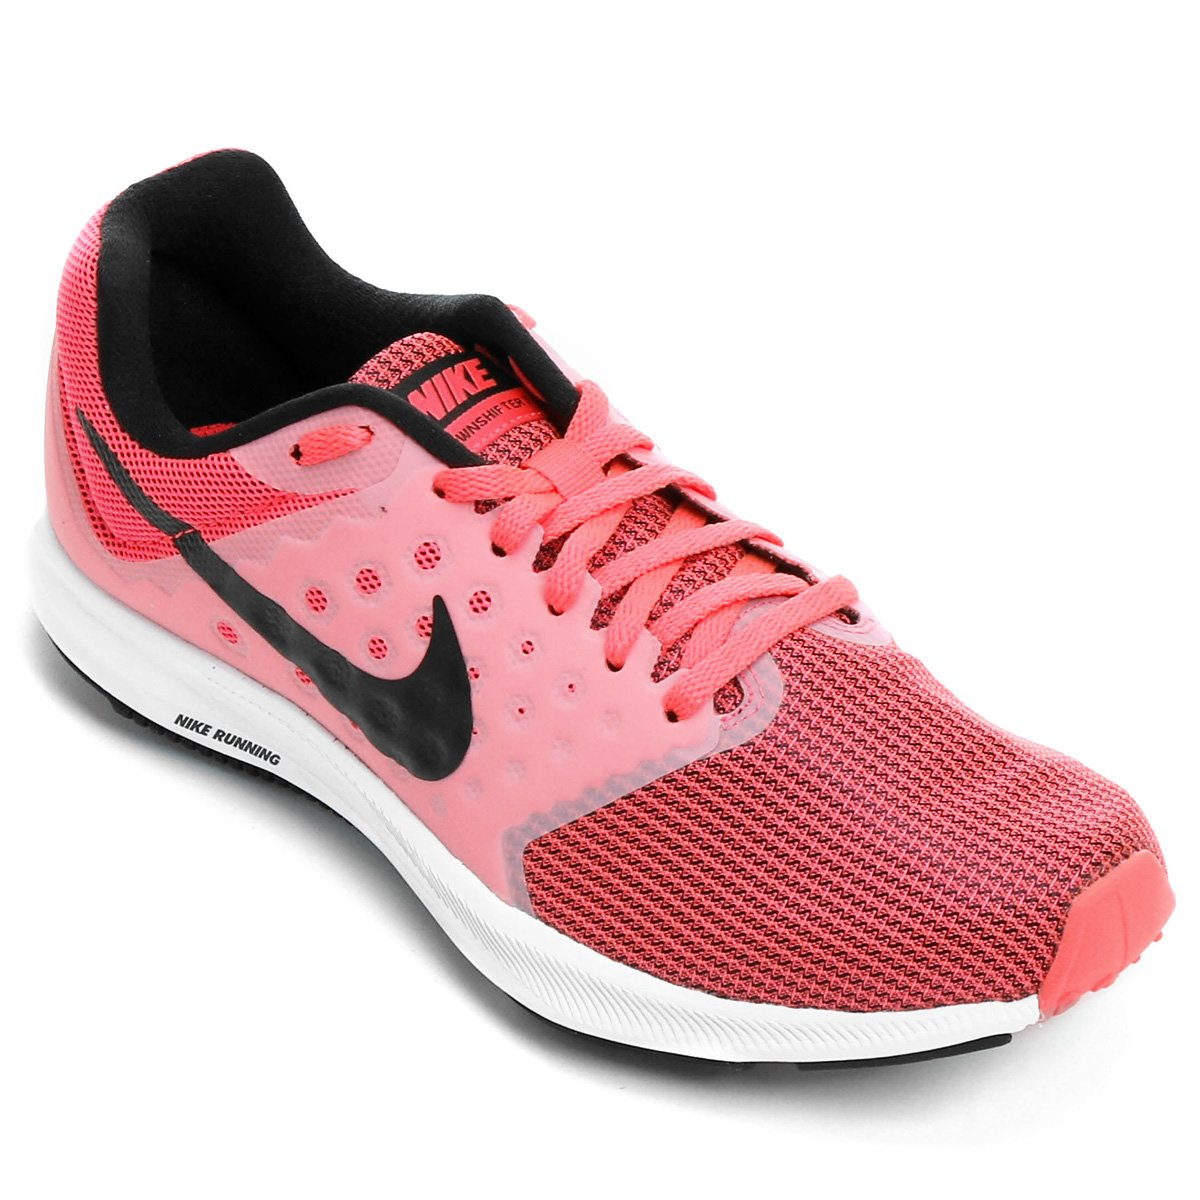 71a128cd14 Tênis Nike Downshifter 7 Feminino - Rosa e Preto | Loja do Inter